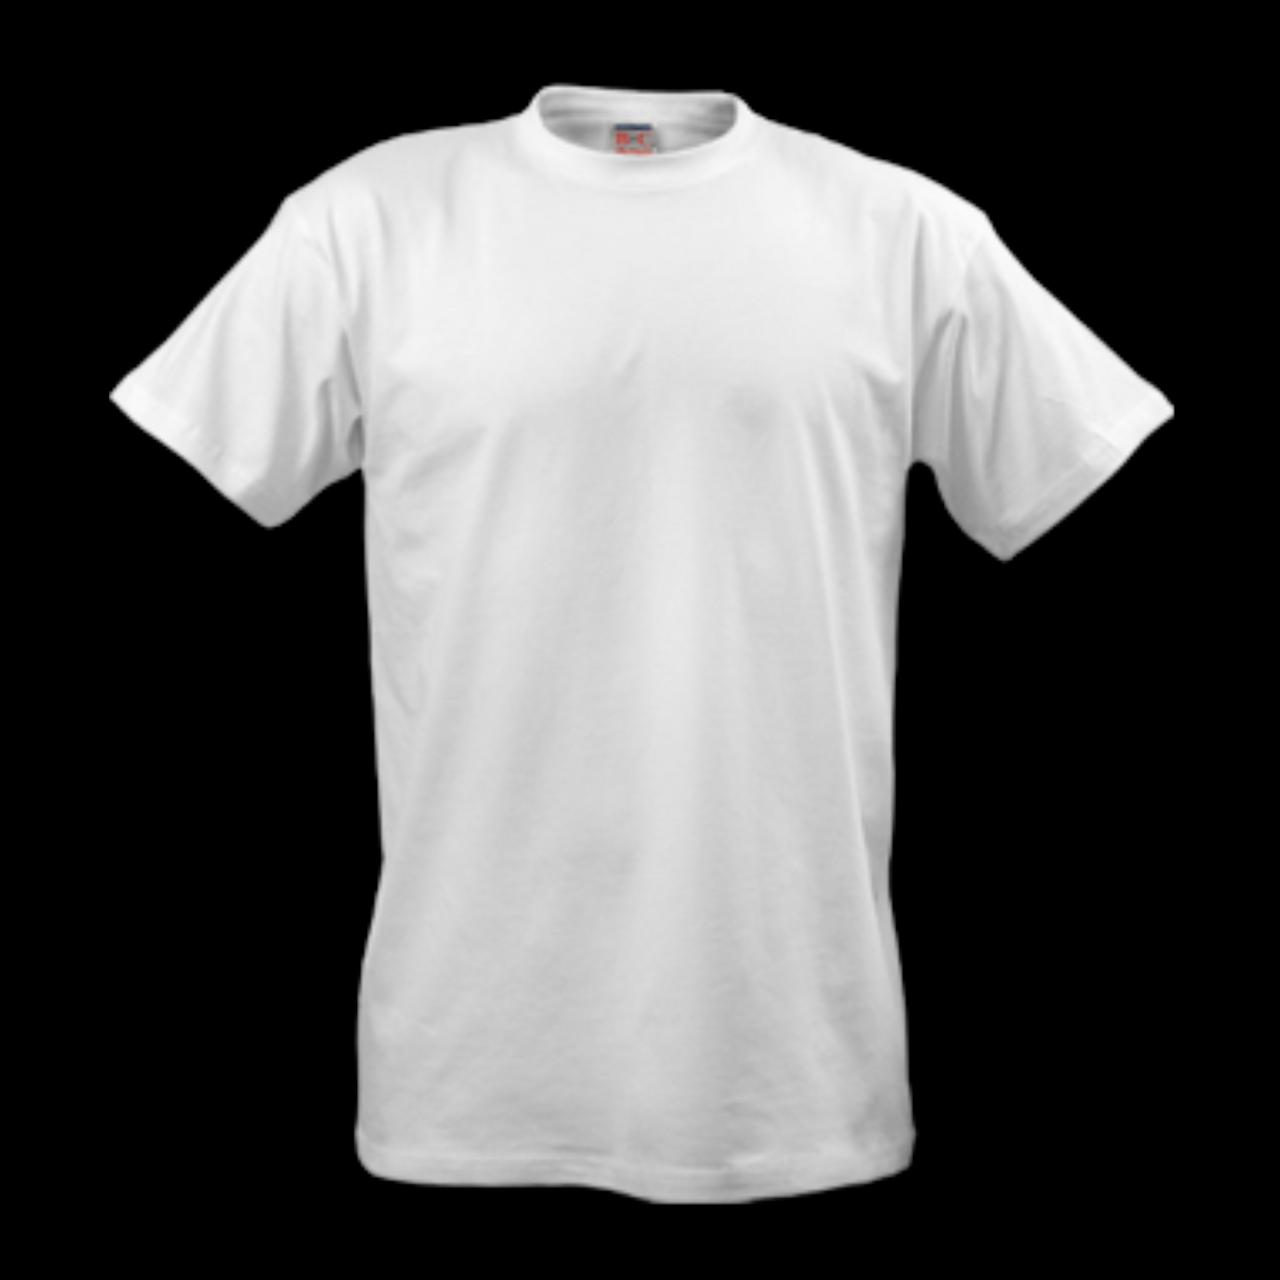 White T-Shirt PNG Image - PurePNG | Free transparent CC0 ...